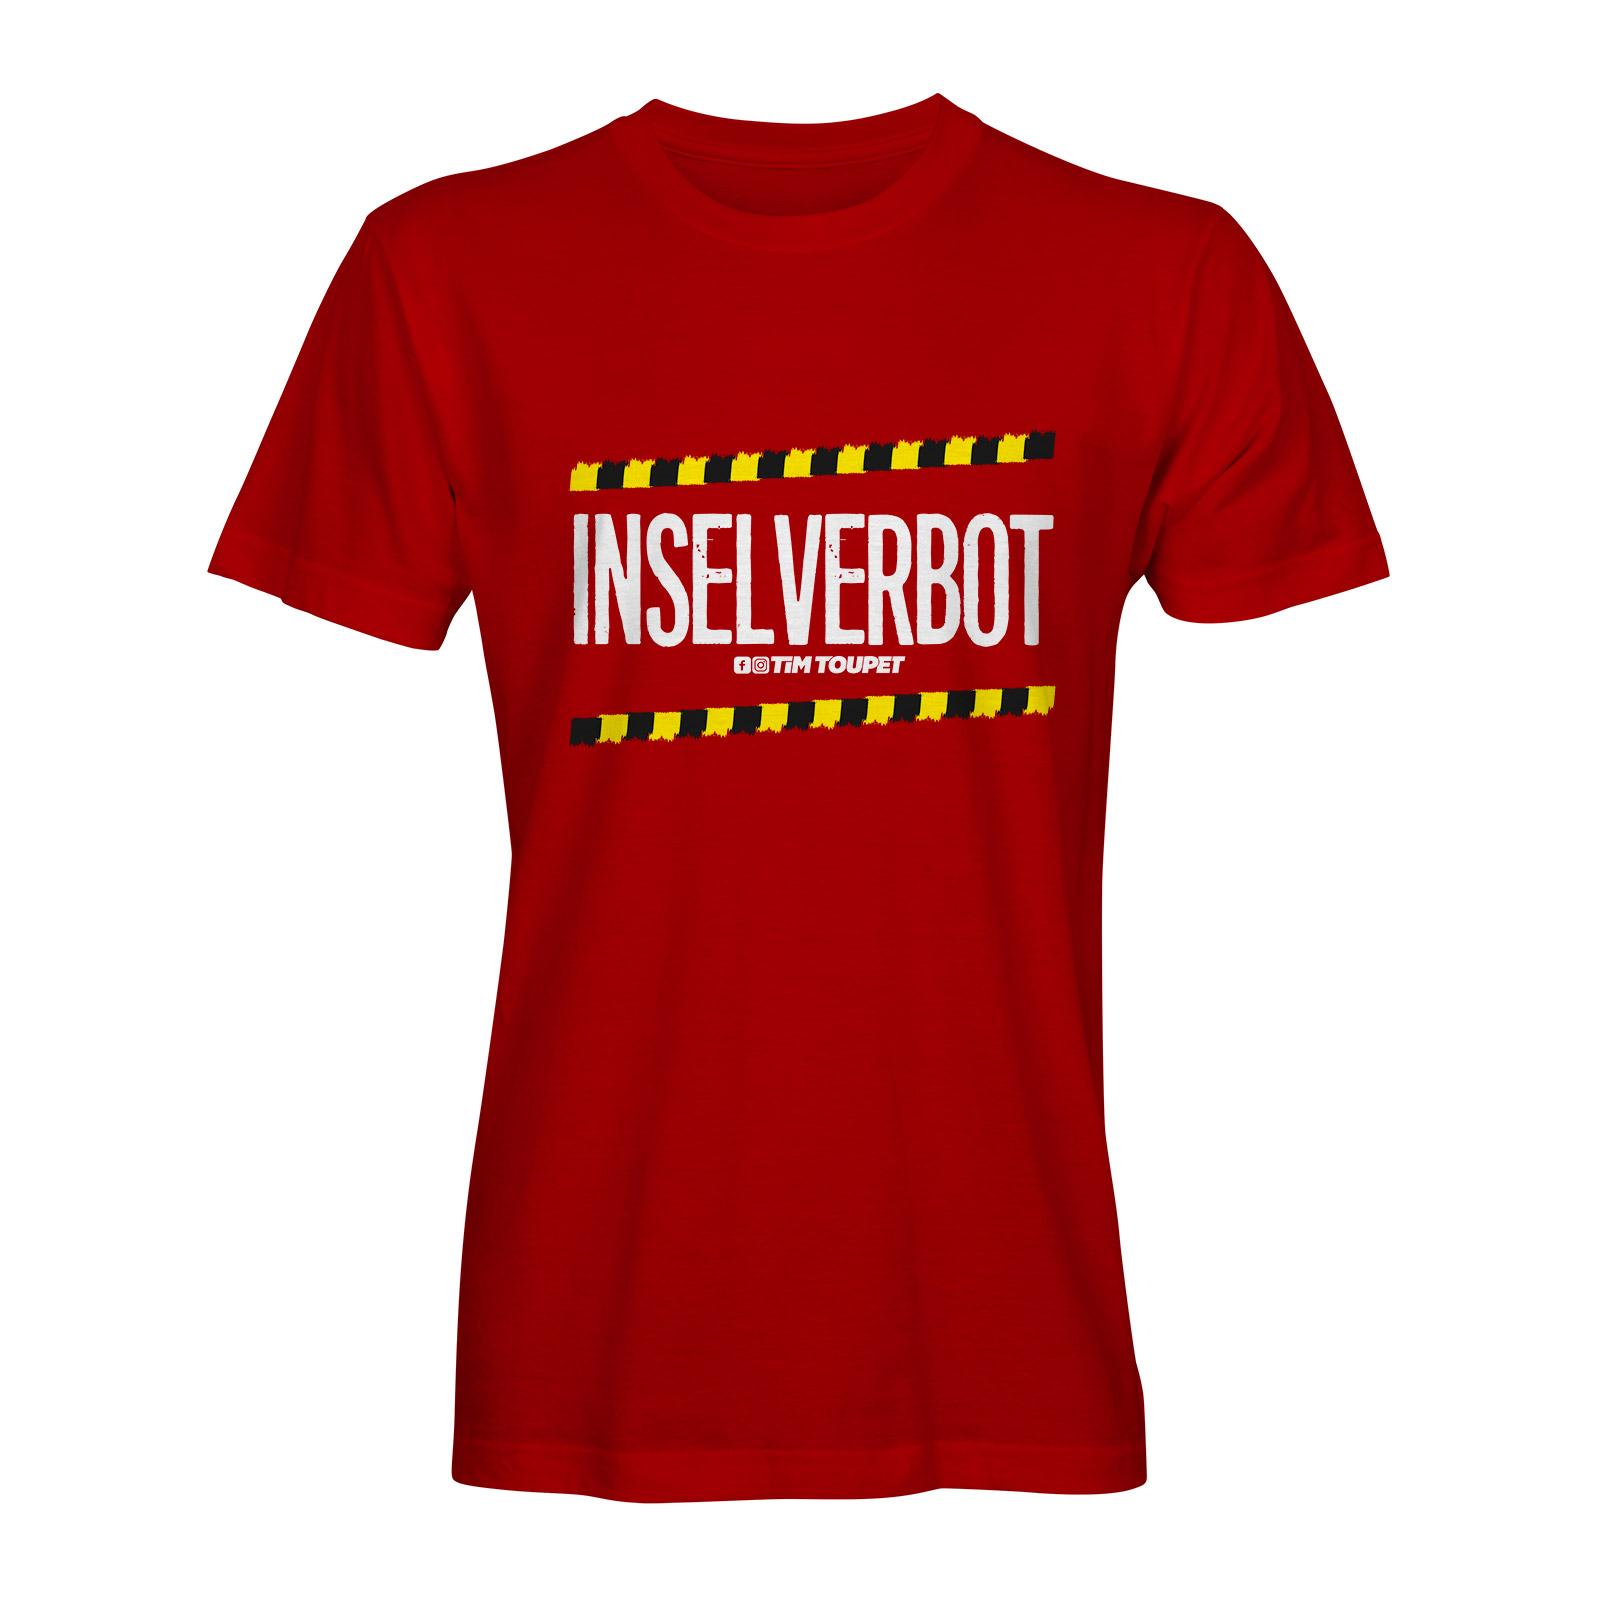 inselverbot tshirt